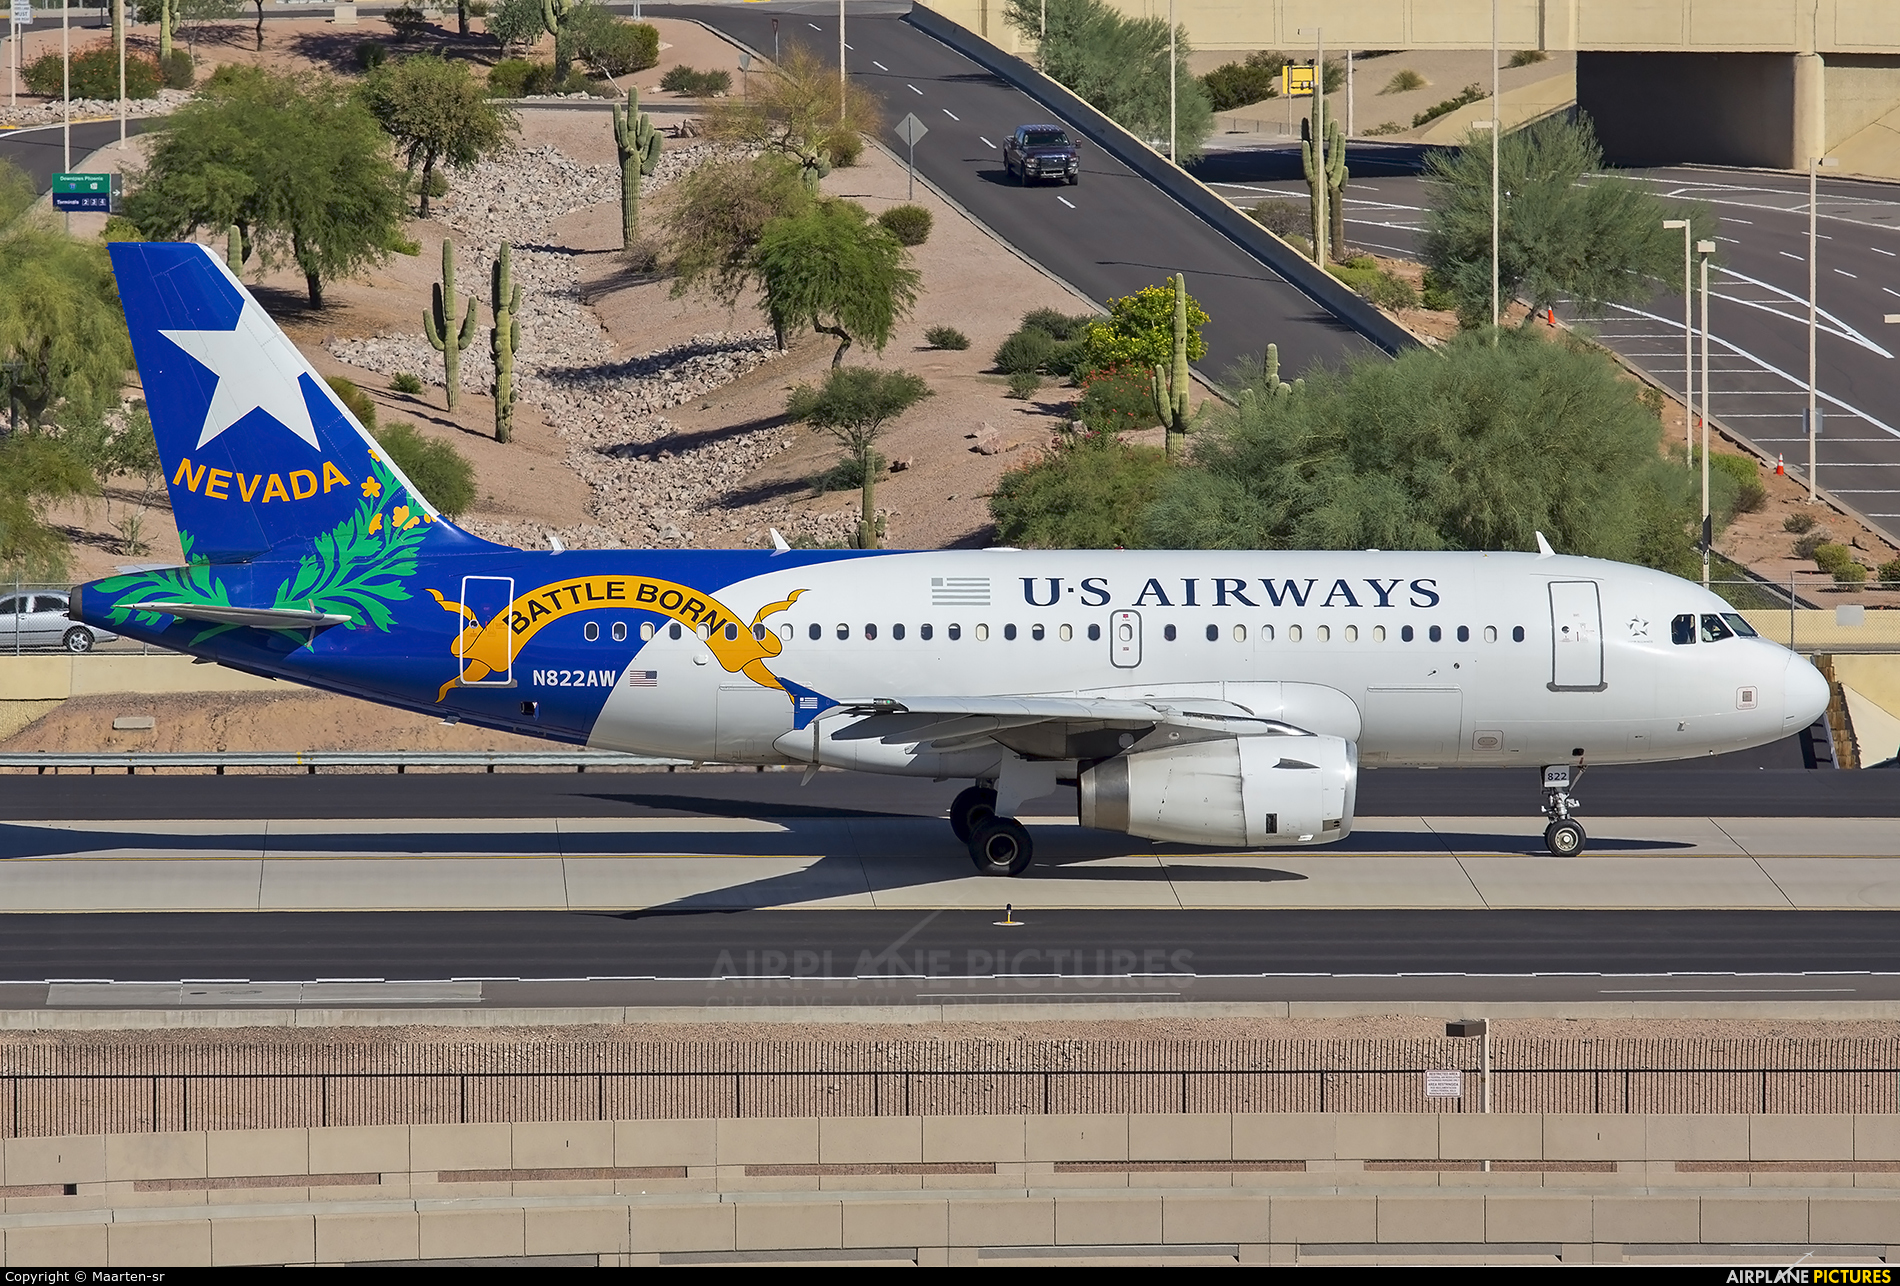 US Airways N822AW aircraft at Phoenix - Sky Harbor Intl